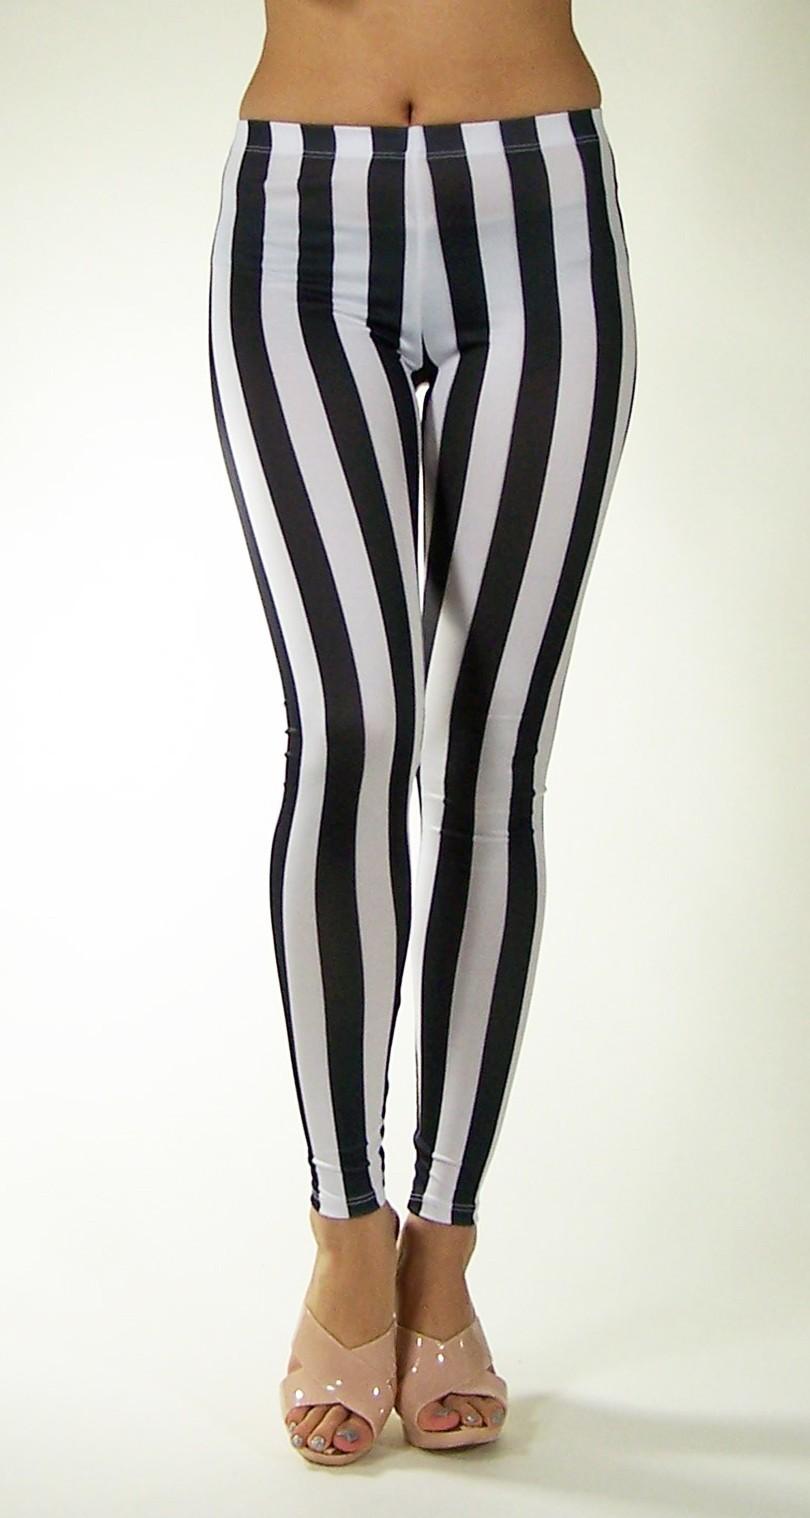 Sexy Women Leggings Black White Vertical Stripe Zebra Stretchy Tights Pants | eBay